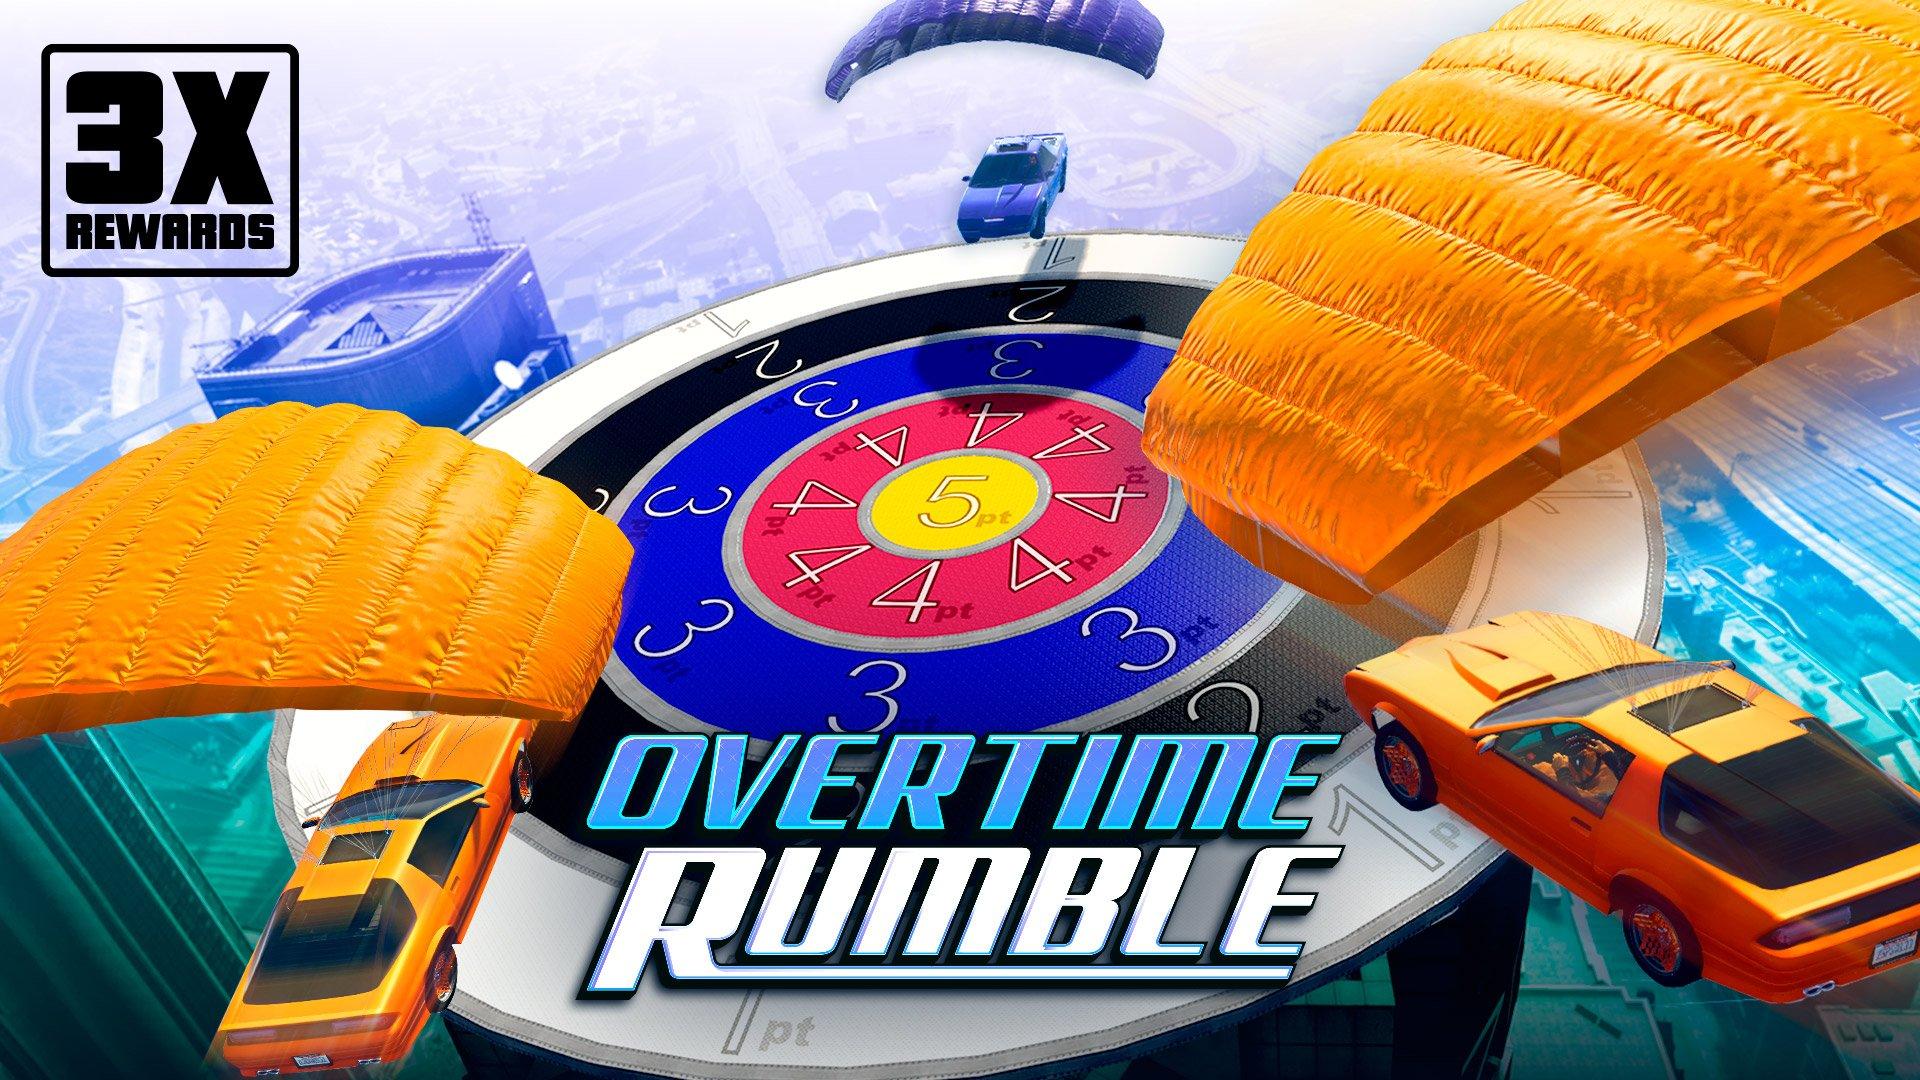 《GTA》在线模式:在加时乱斗高飞滑翔 享3倍奖励